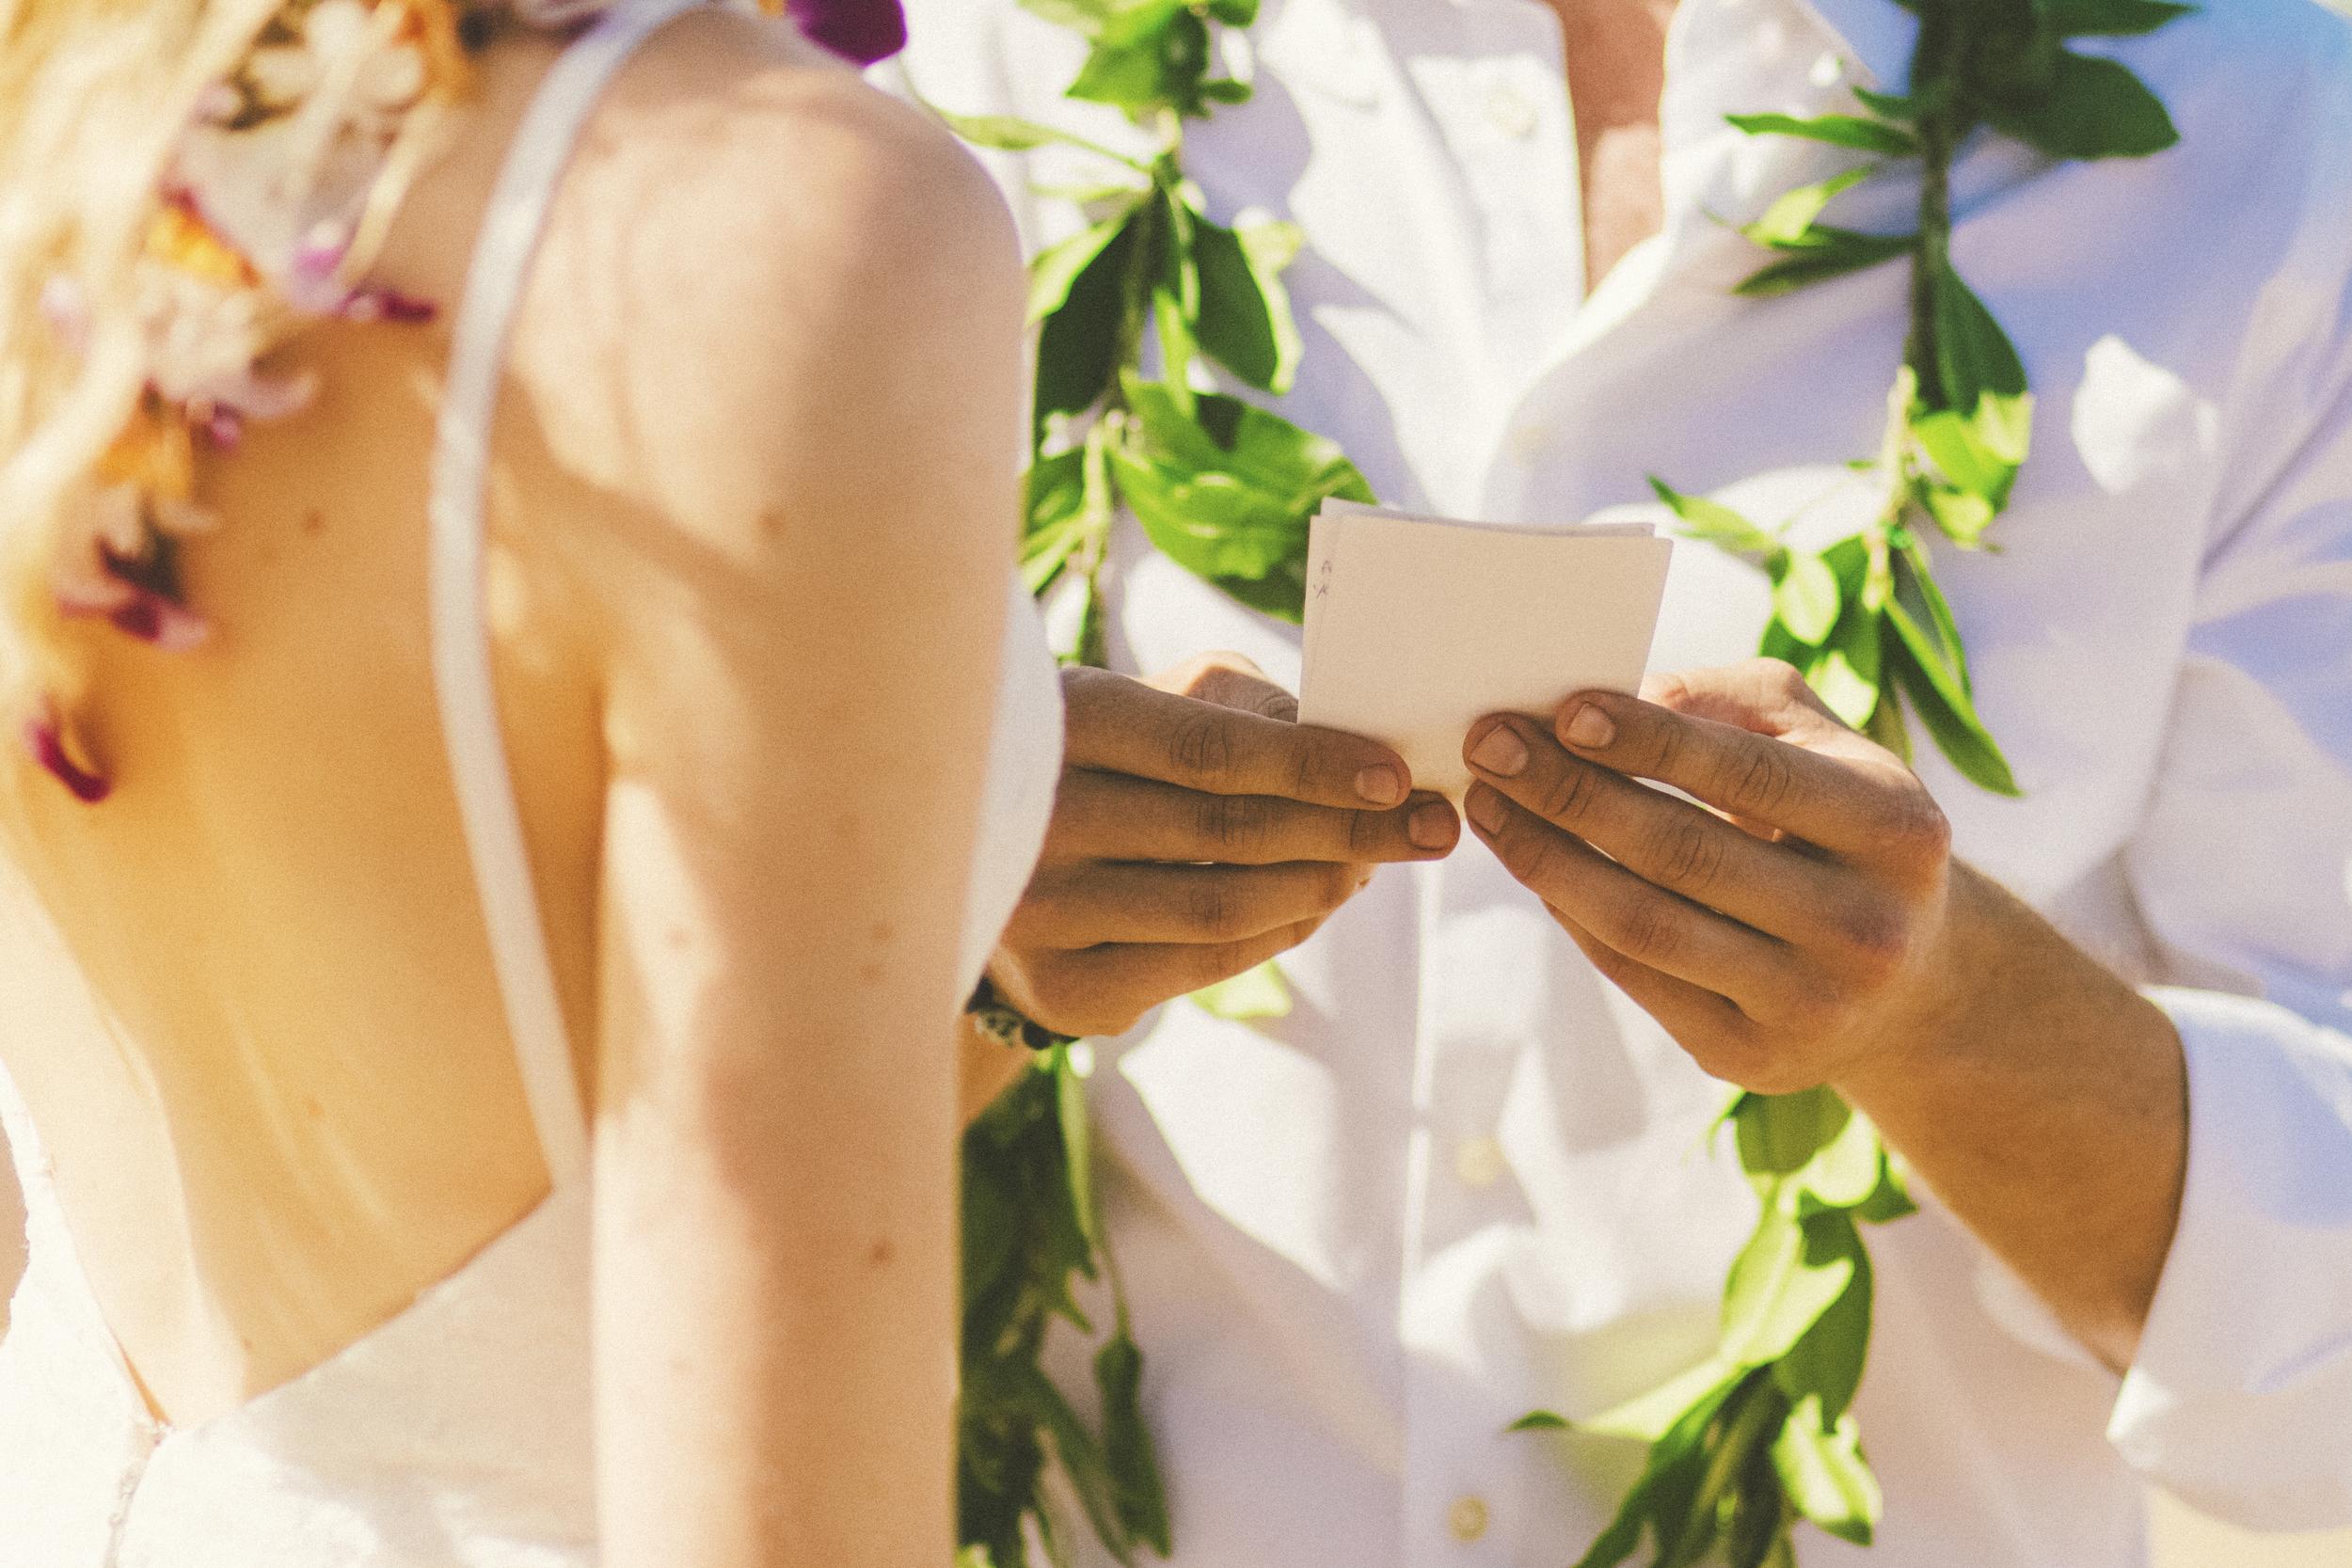 angie-diaz-photography-maui-wedding-52.jpg